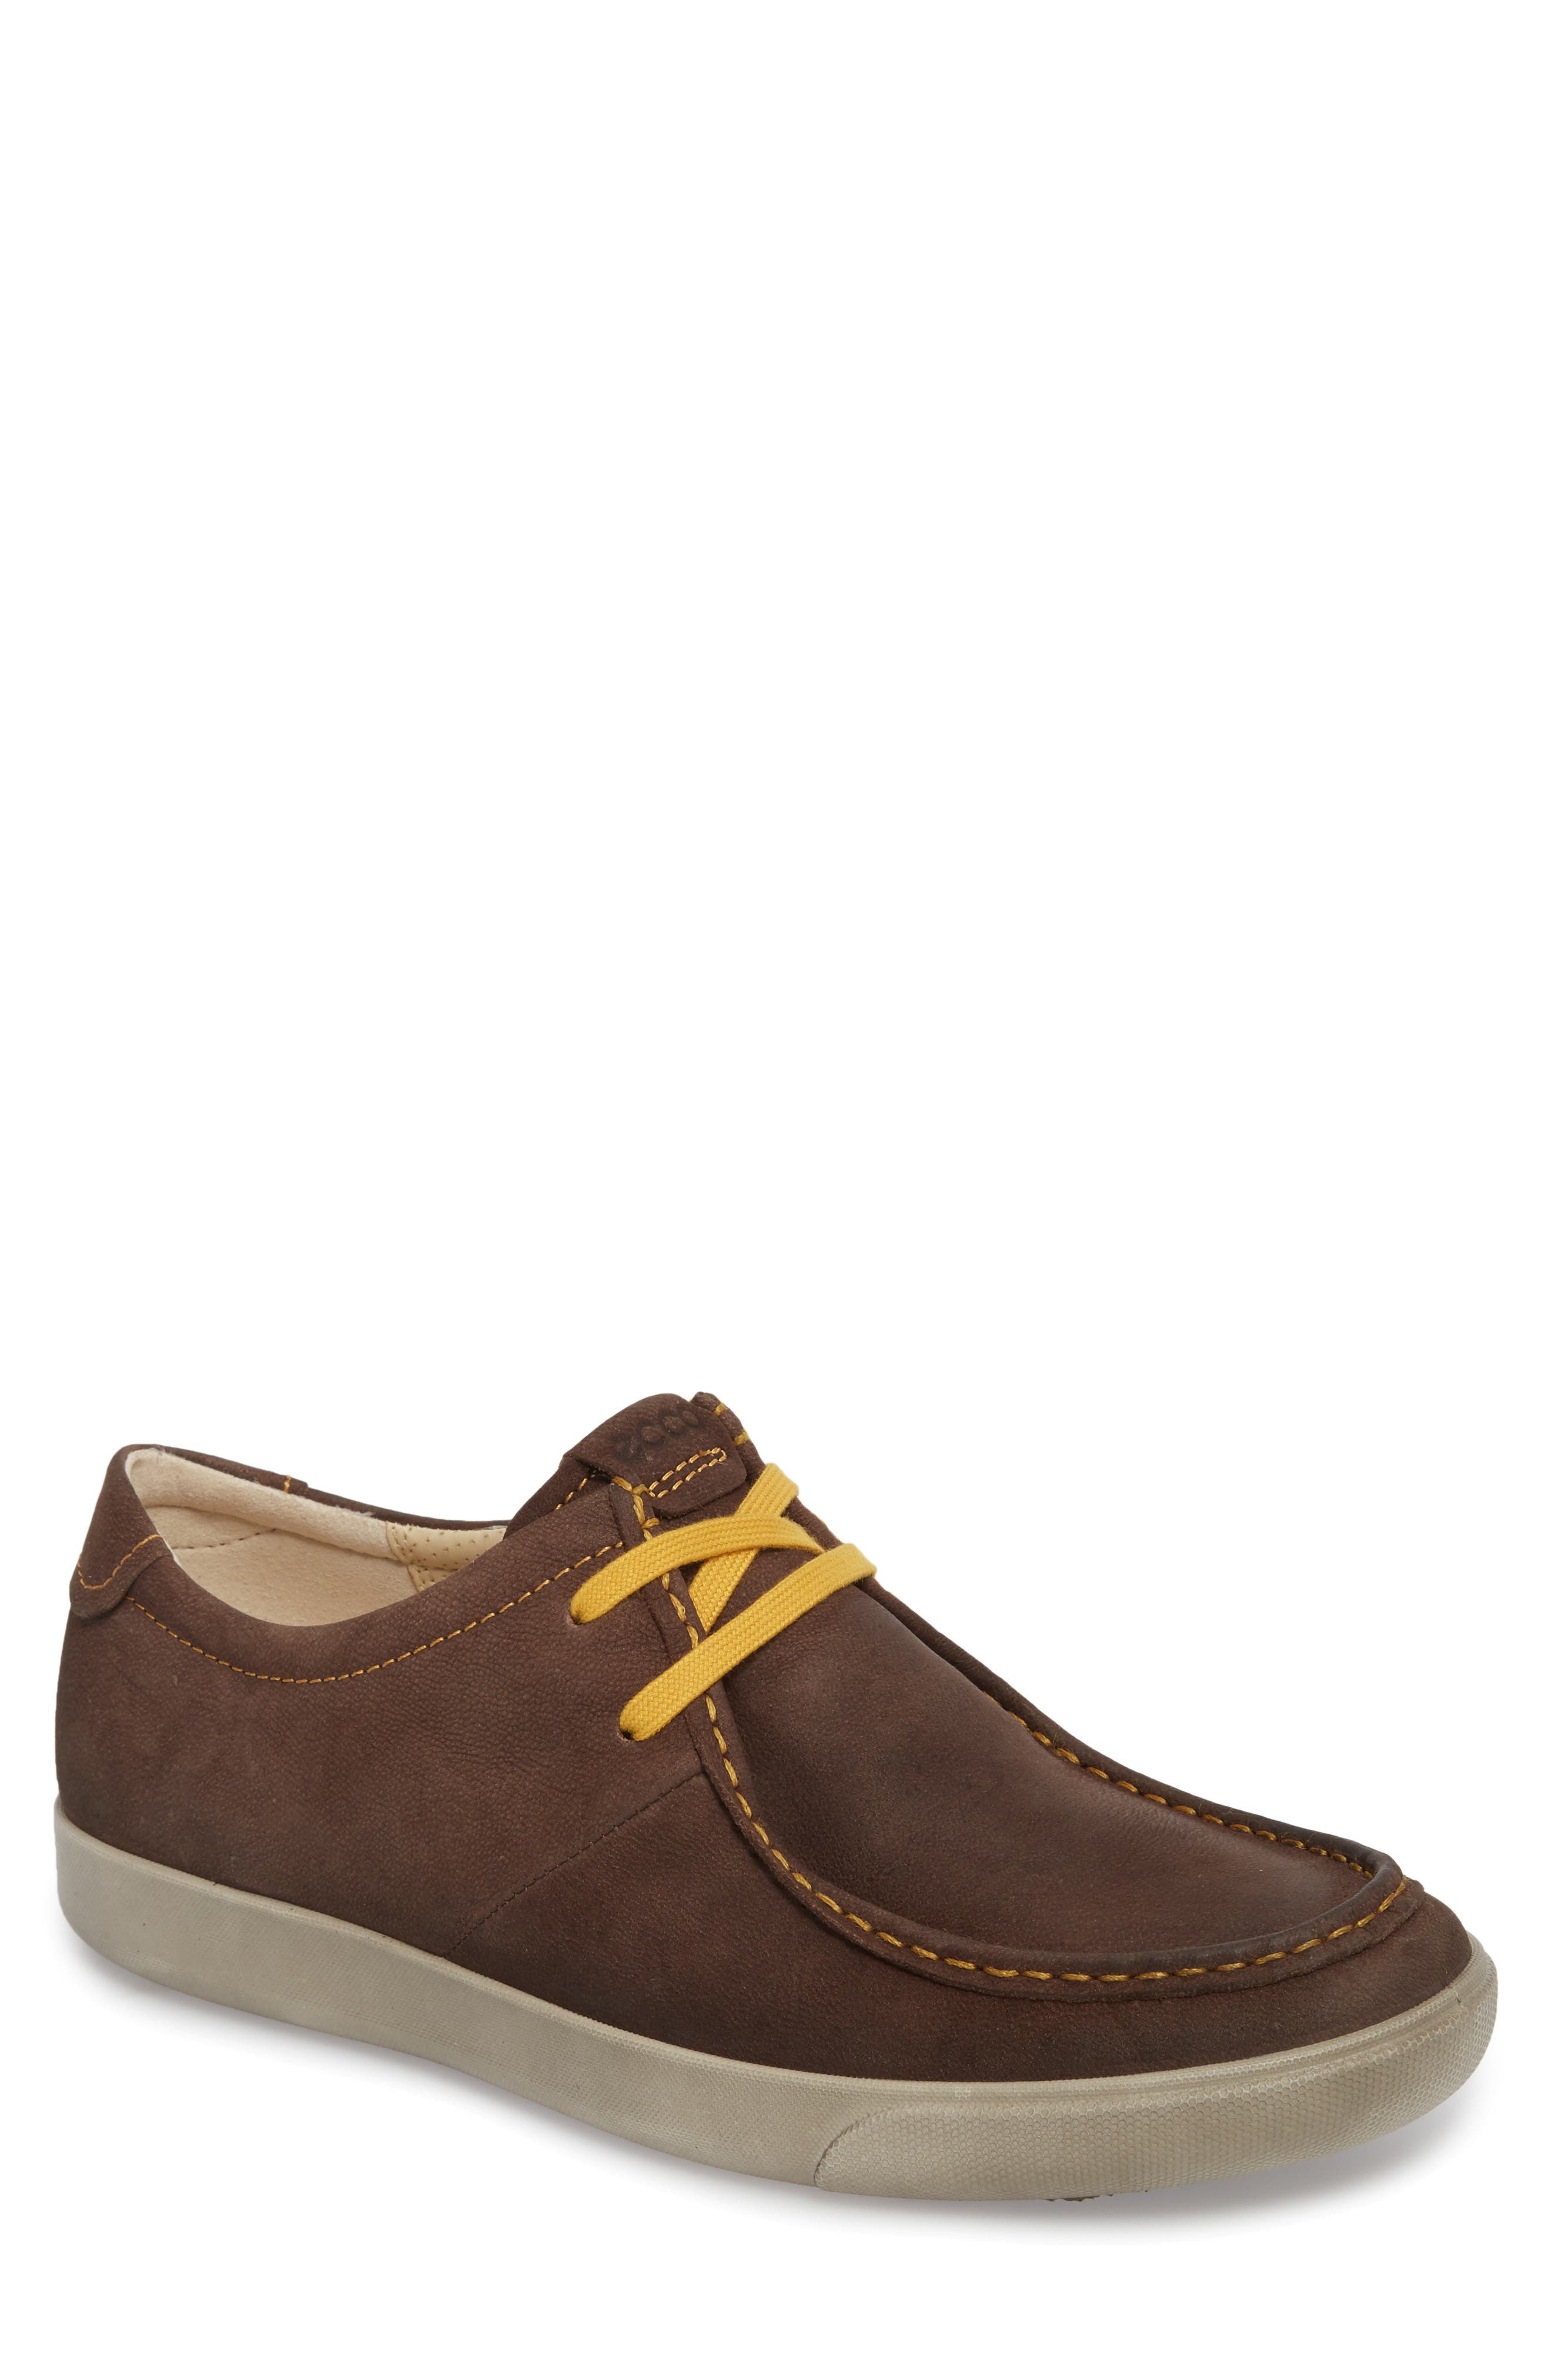 Gary Sneaker,                         Main,                         color, Mocha Leather